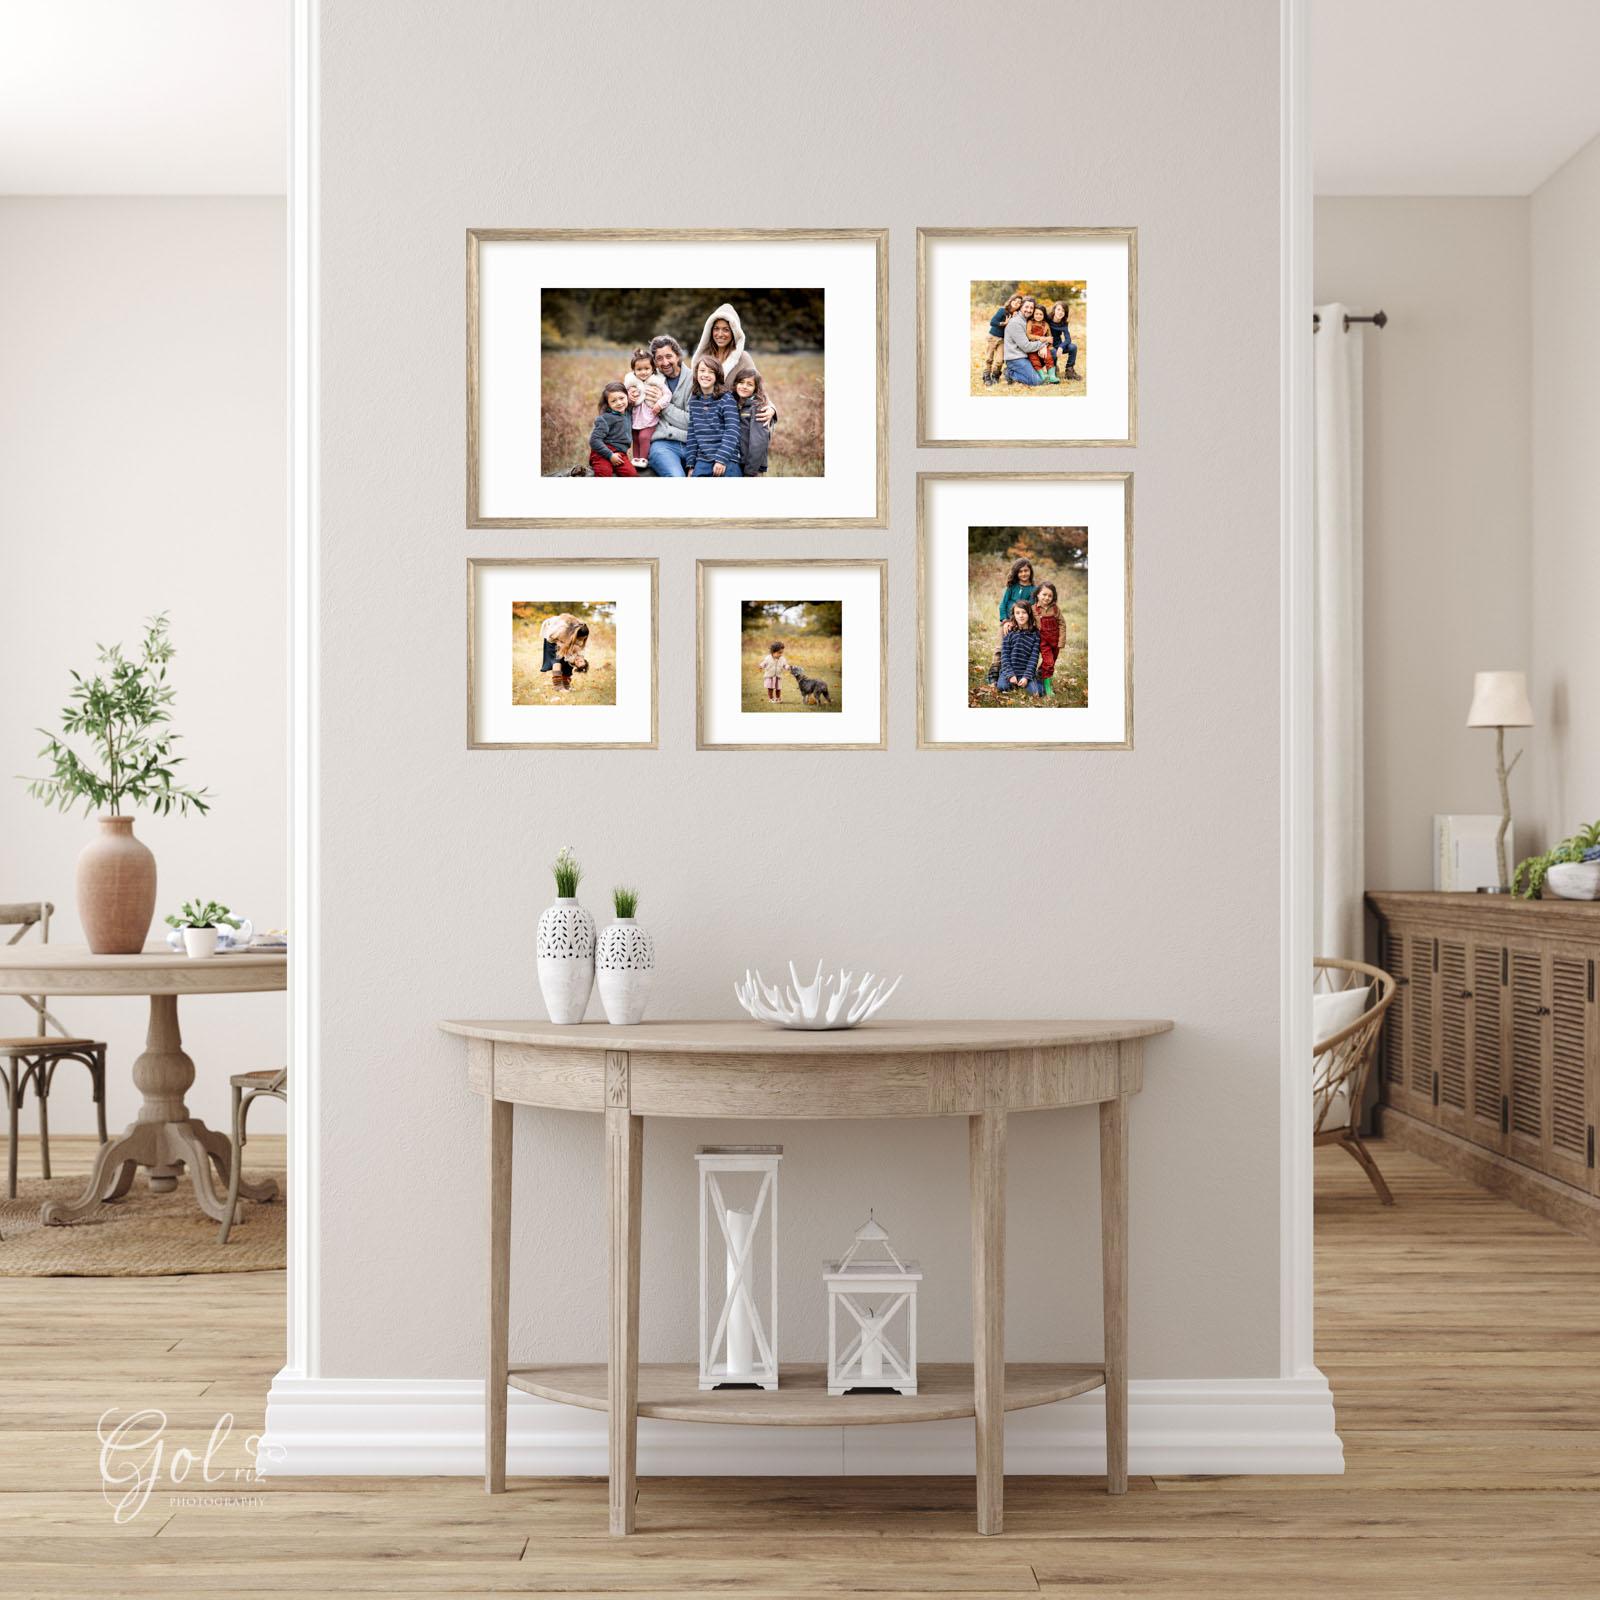 autumn-family-photography-richmond- GolrizPhotoraphy1-3